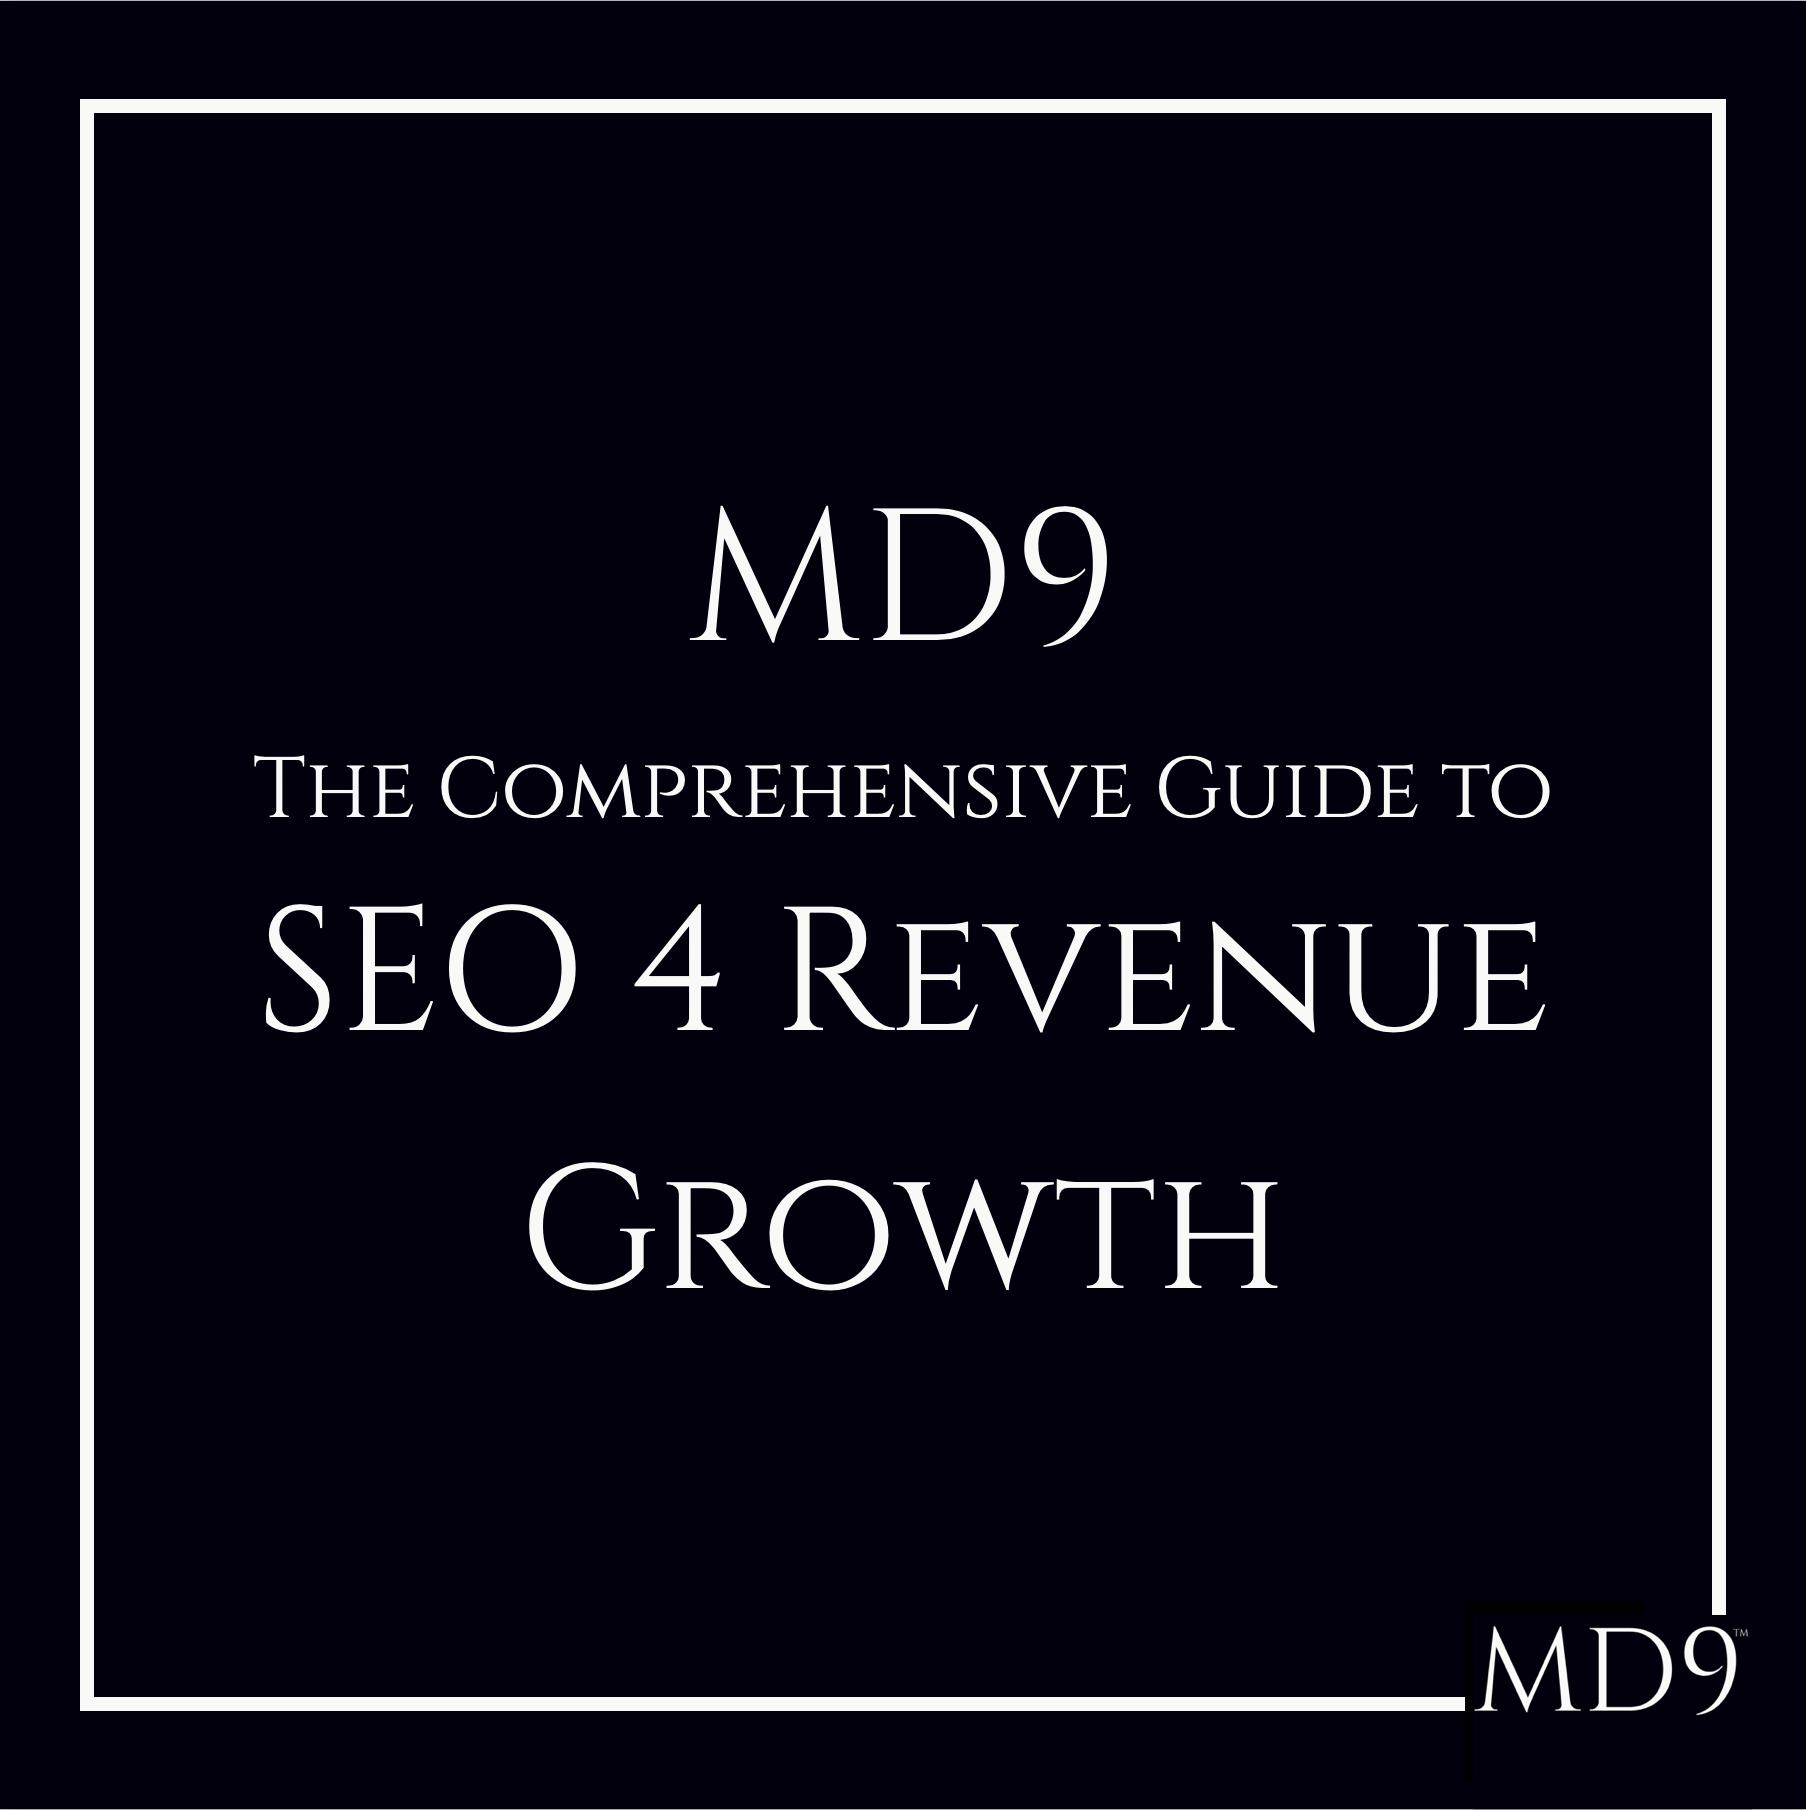 SEO 4 Revenue Growth